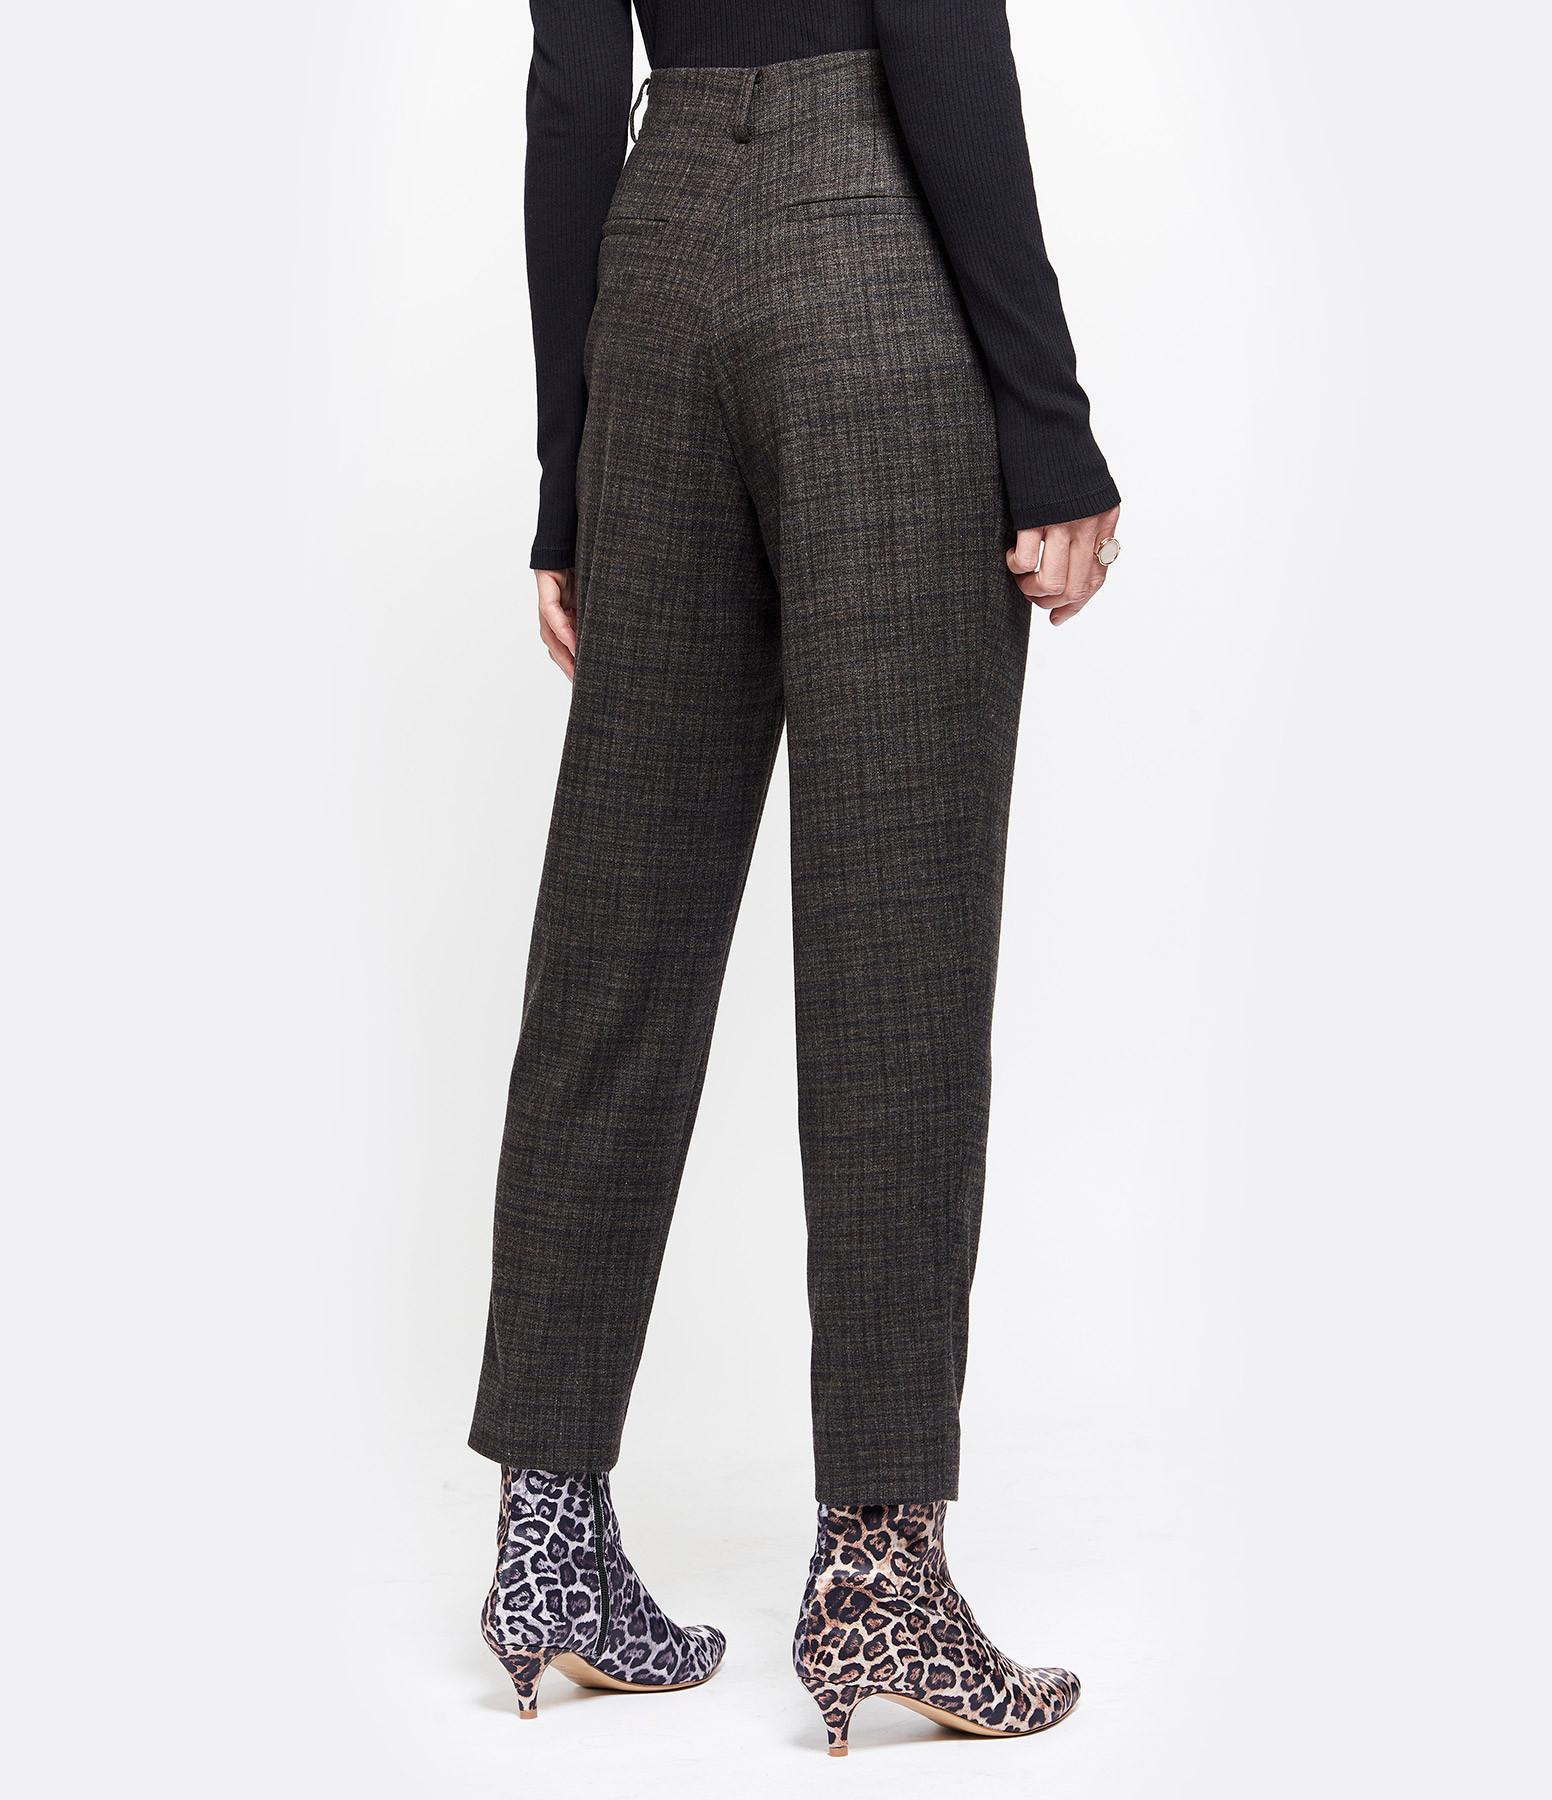 VANESSA BRUNO - Pantalon Malice Laine Ebene